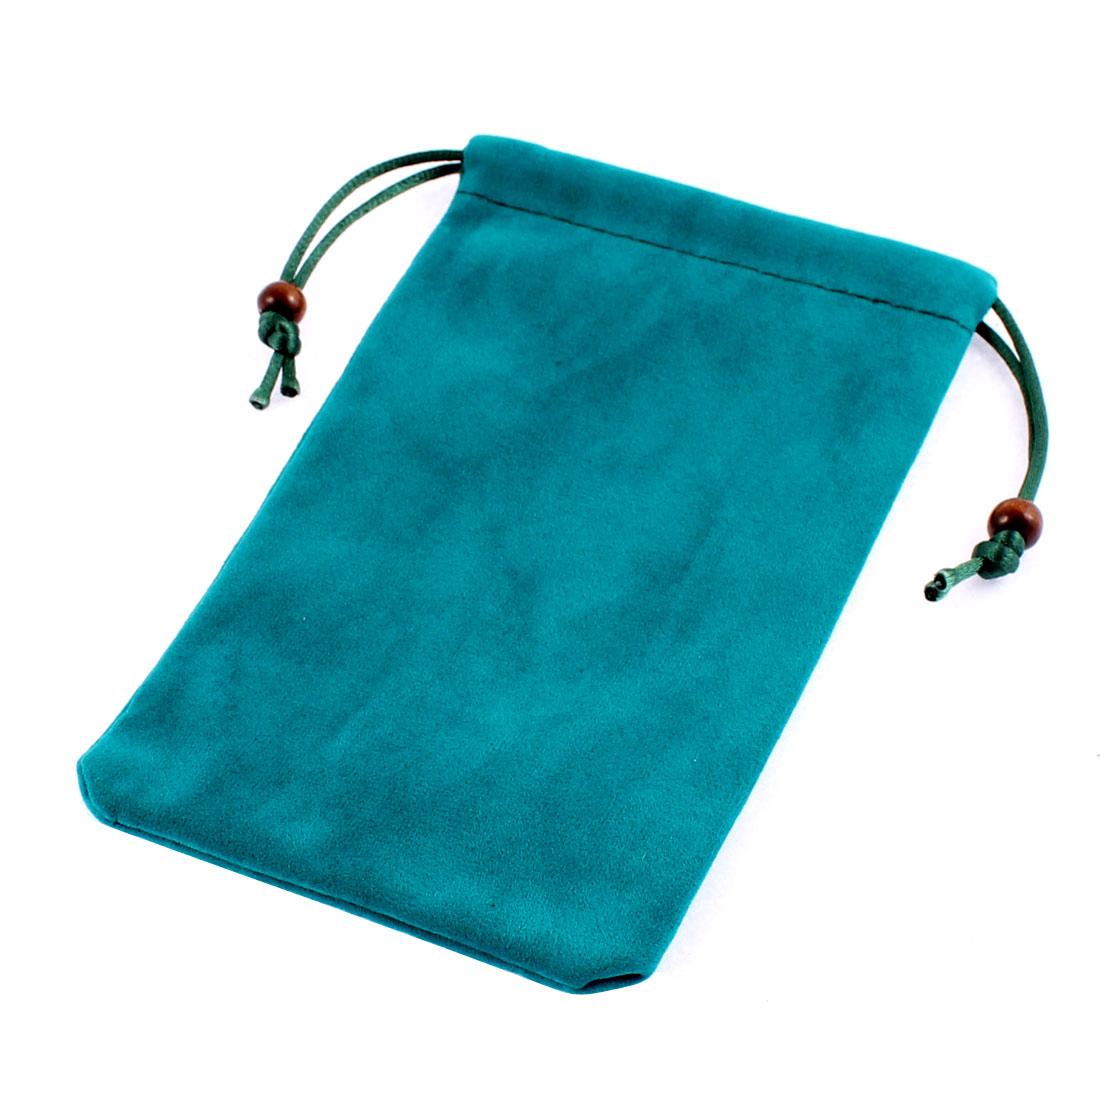 "Velvet Cell Phone Smartphone Pouch Sleeve Bag Holder Cyan 6"" Long"